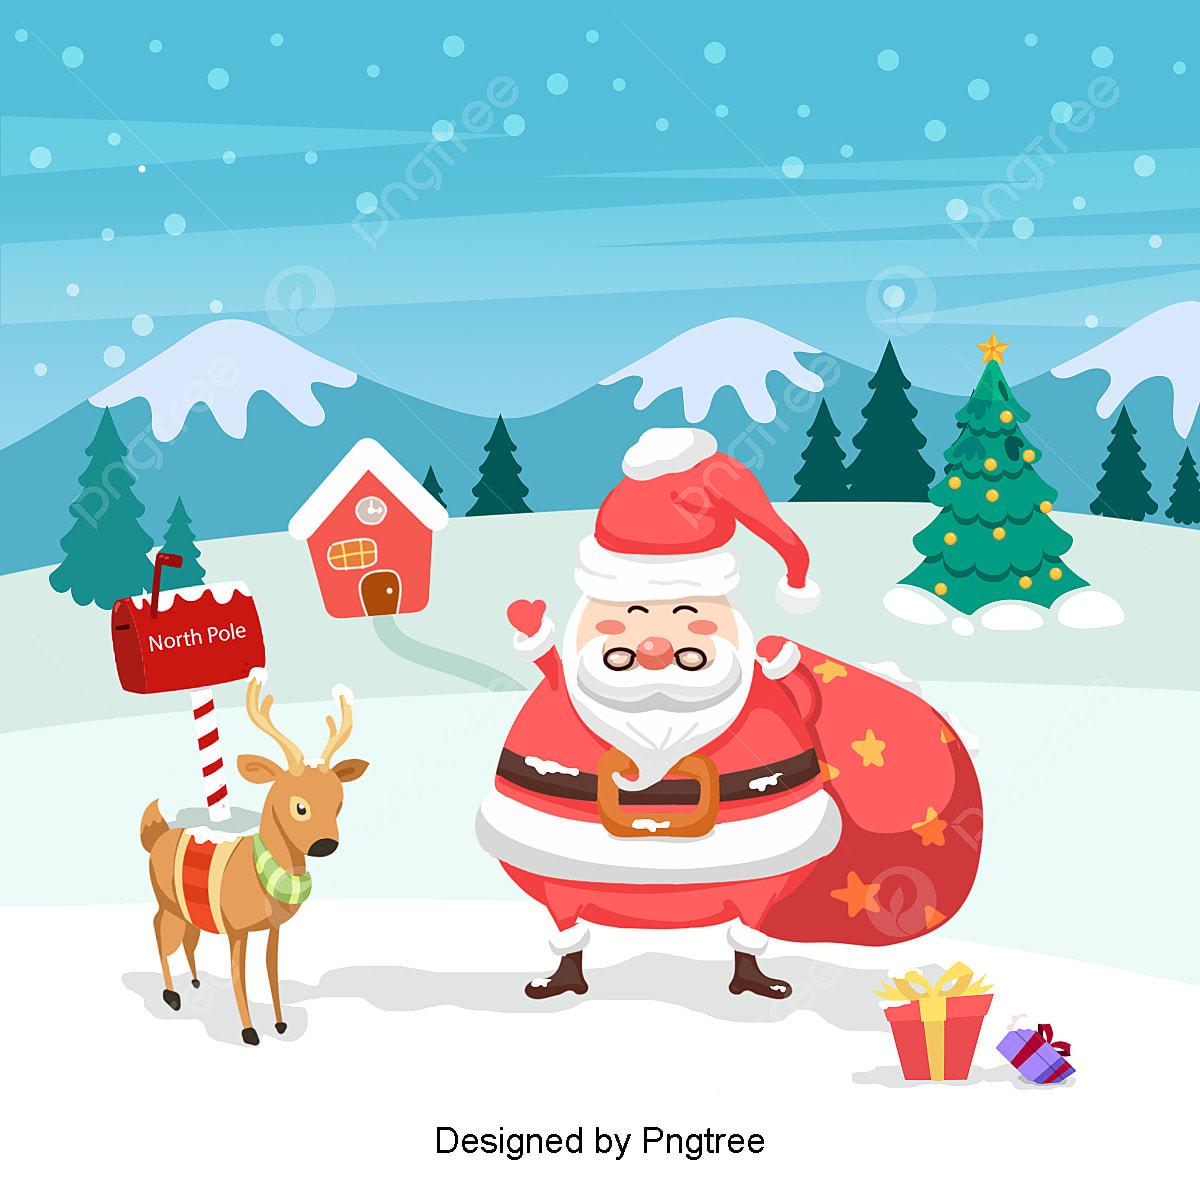 Christmas Celebration Cartoon Images.Korean Cartoon Santa Claus Christmas Celebration Xie And